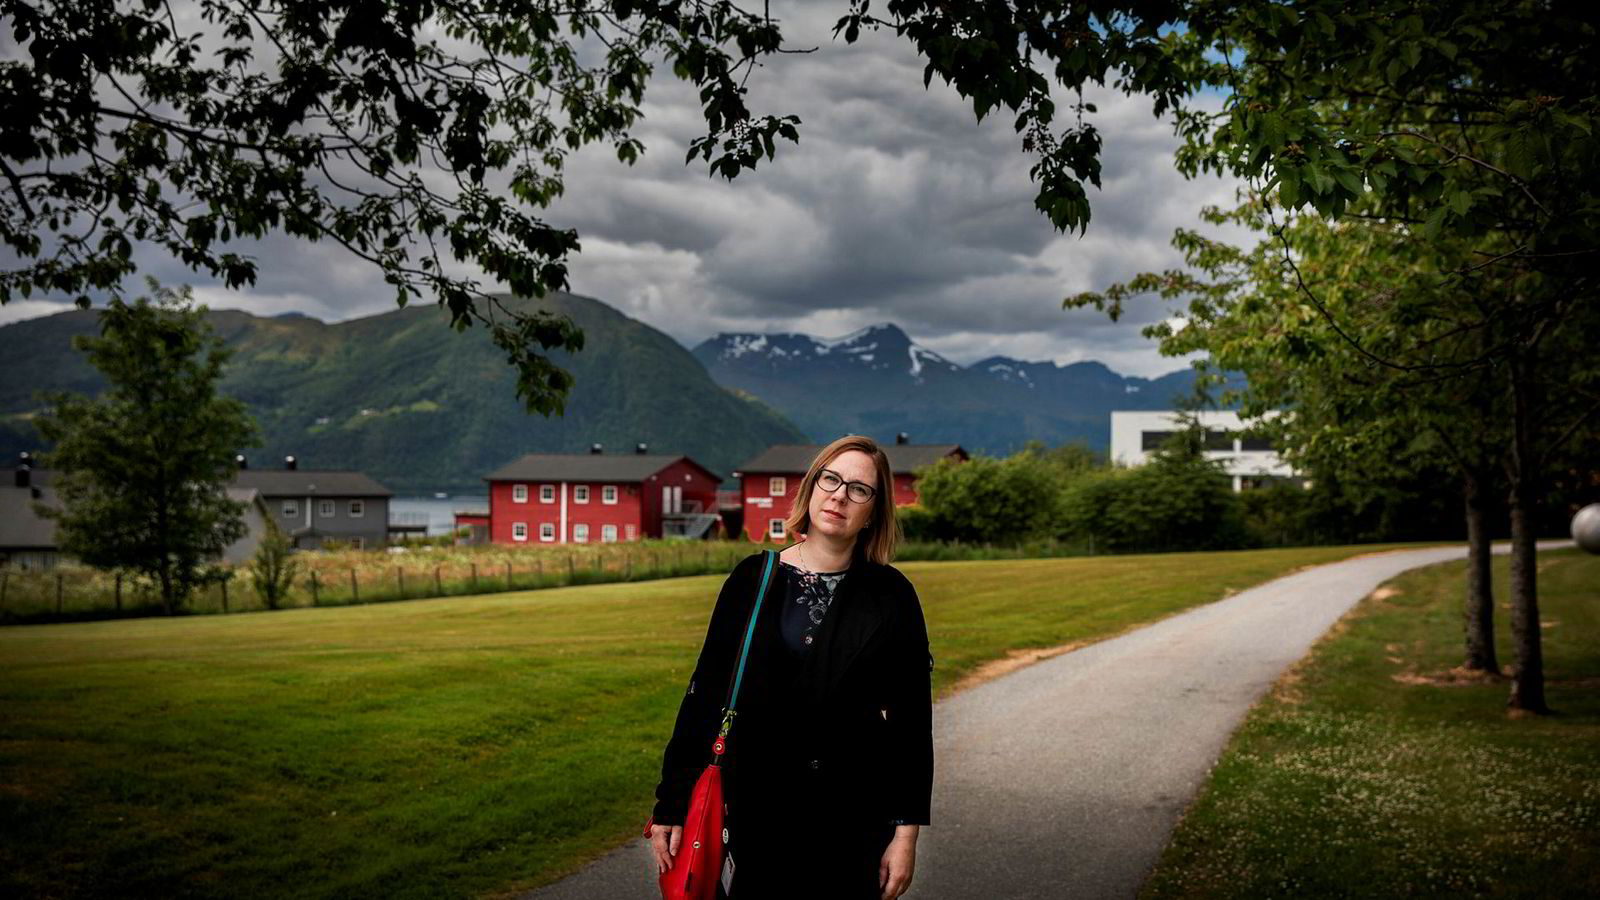 Konflikten rundt dekan Audhild Gregoriusdotter Rotevatn ved Høgskulen i Volda er blitt en studie i hvordan ikke håndtere en vanskelig konflikt- og personalsak.